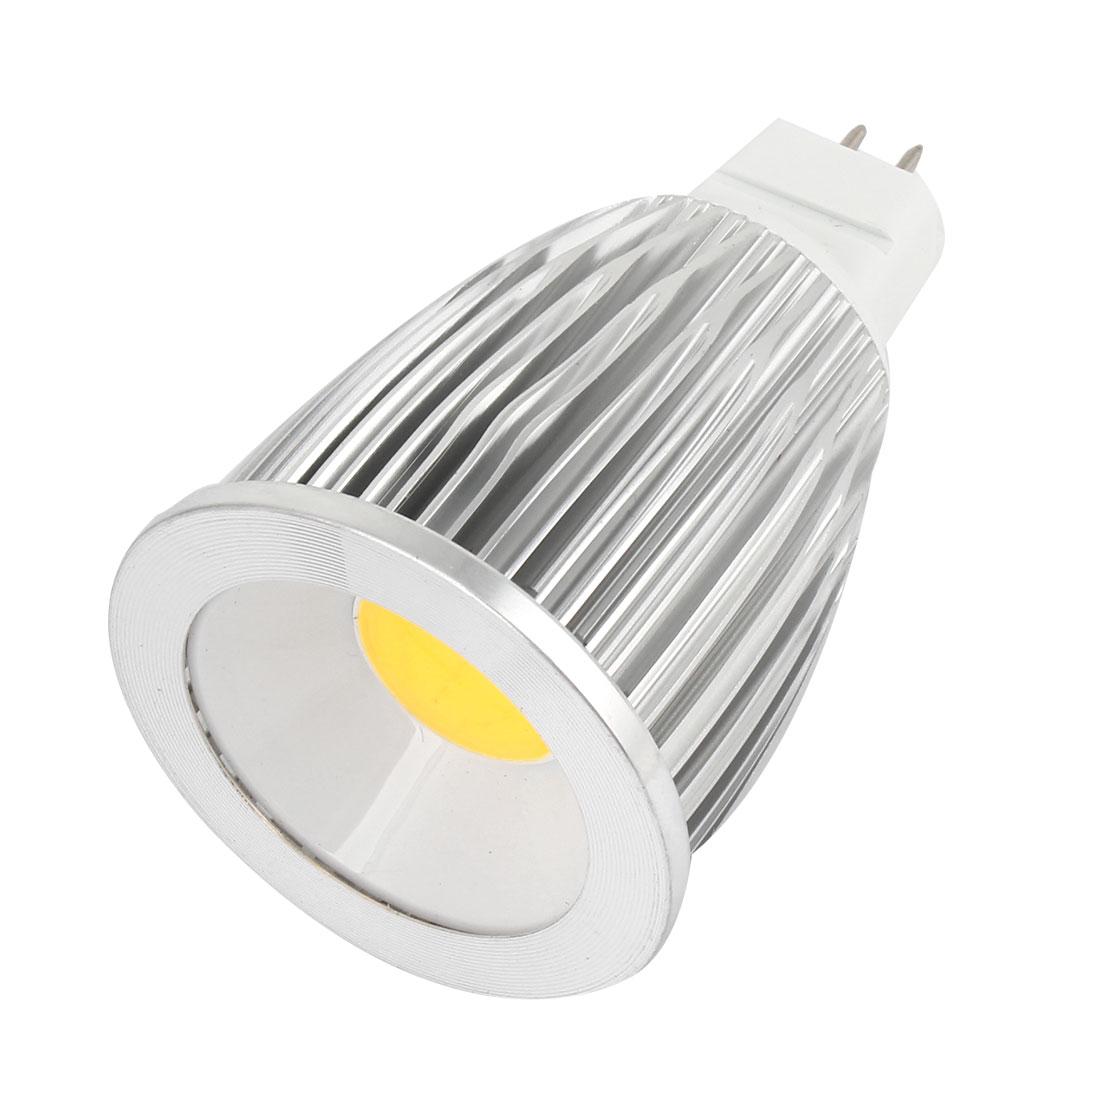 AC 12V 12W MR16 Dimmable Warm White Light COB LED Downlight Spotlight Bulb